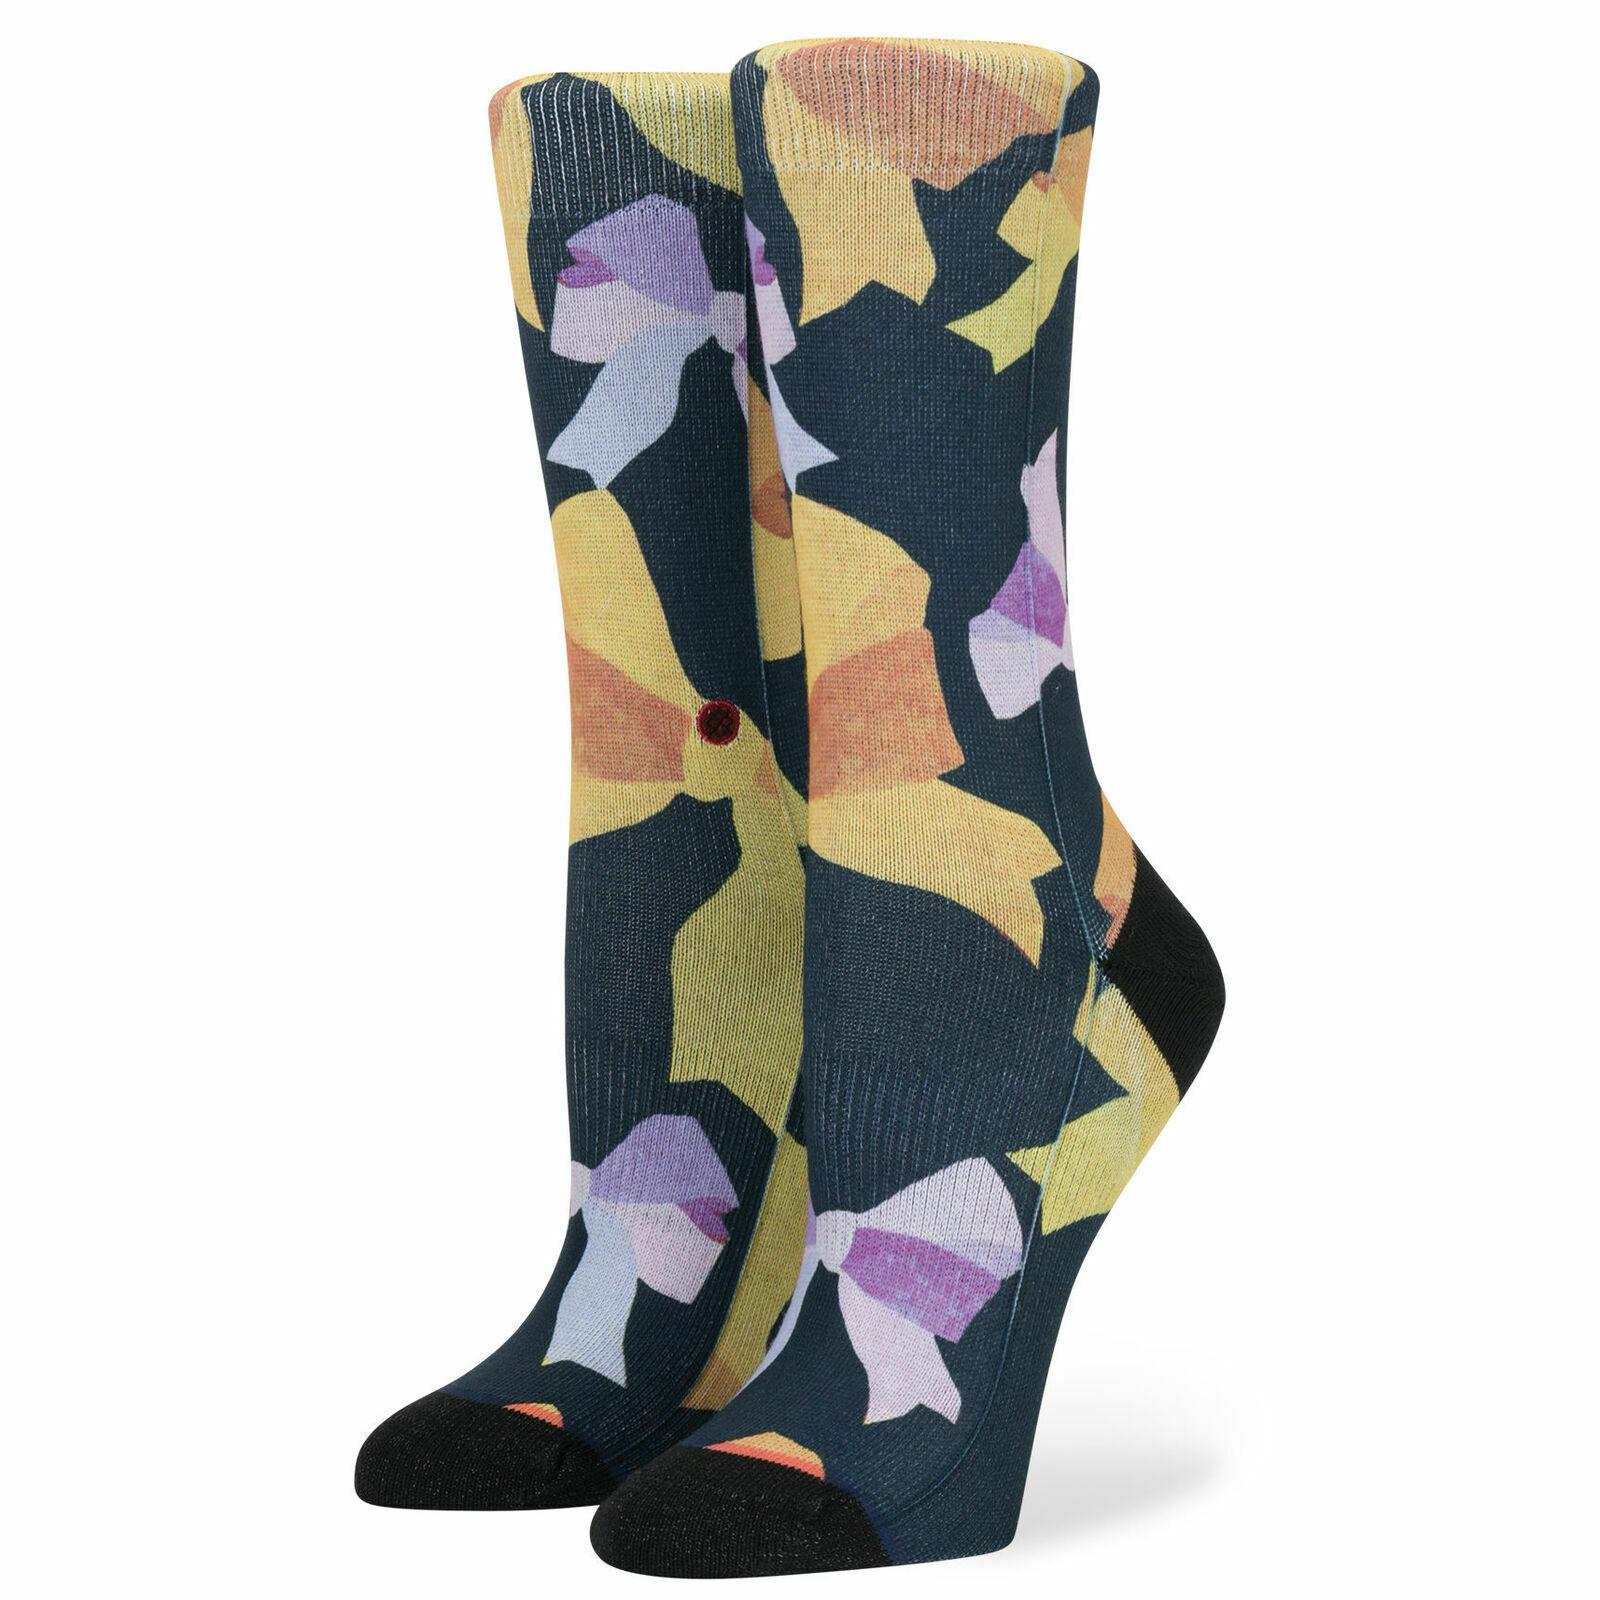 Stance Women's Tomboy Light Cushion Crew Socks Ines Longevial 5-7.5 8-10.5 New